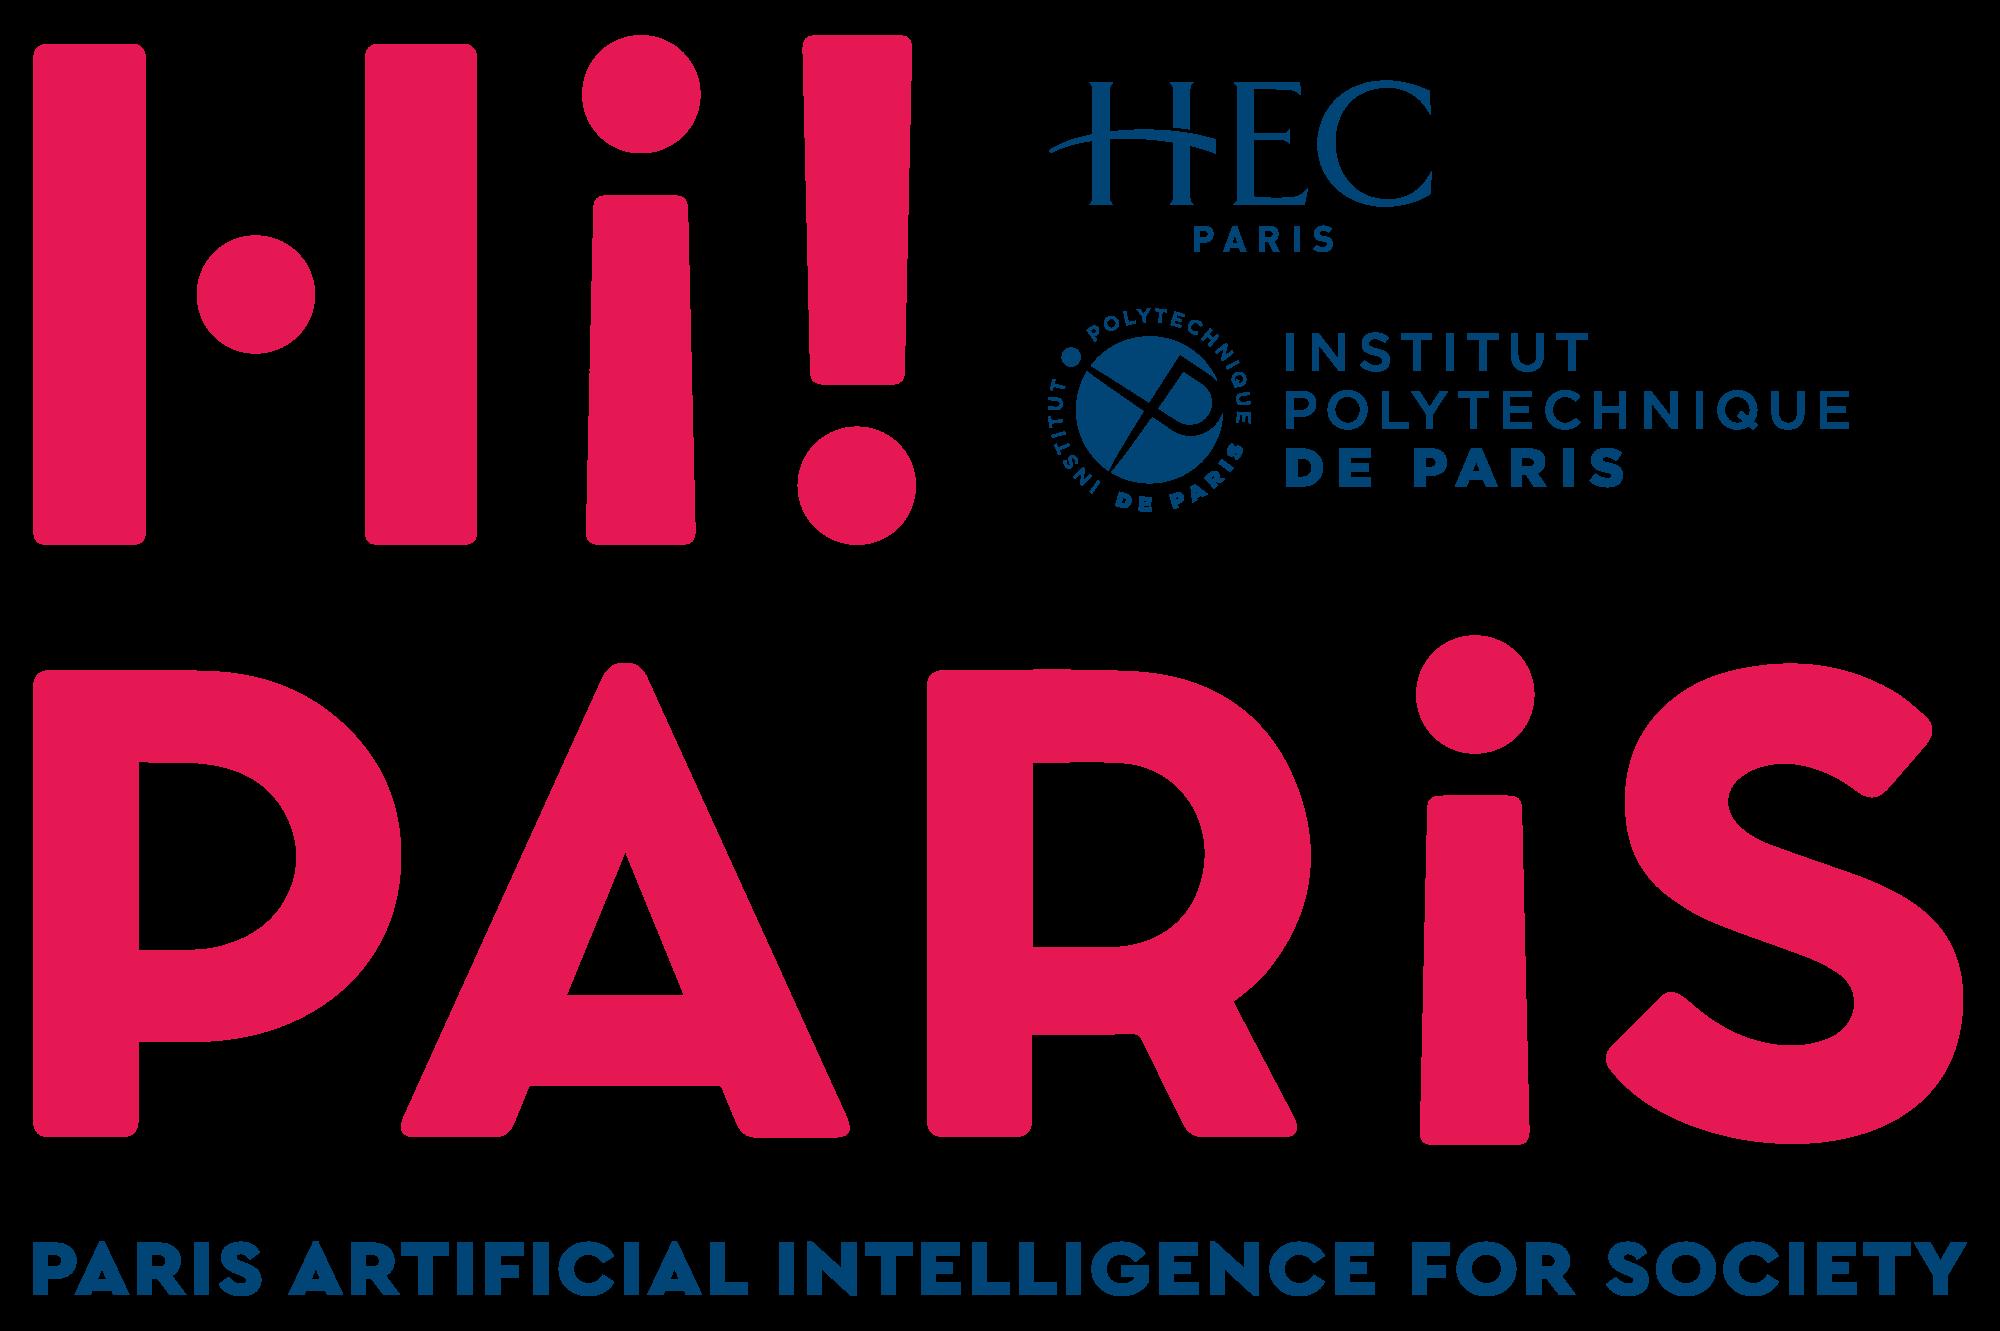 Hi! Paris